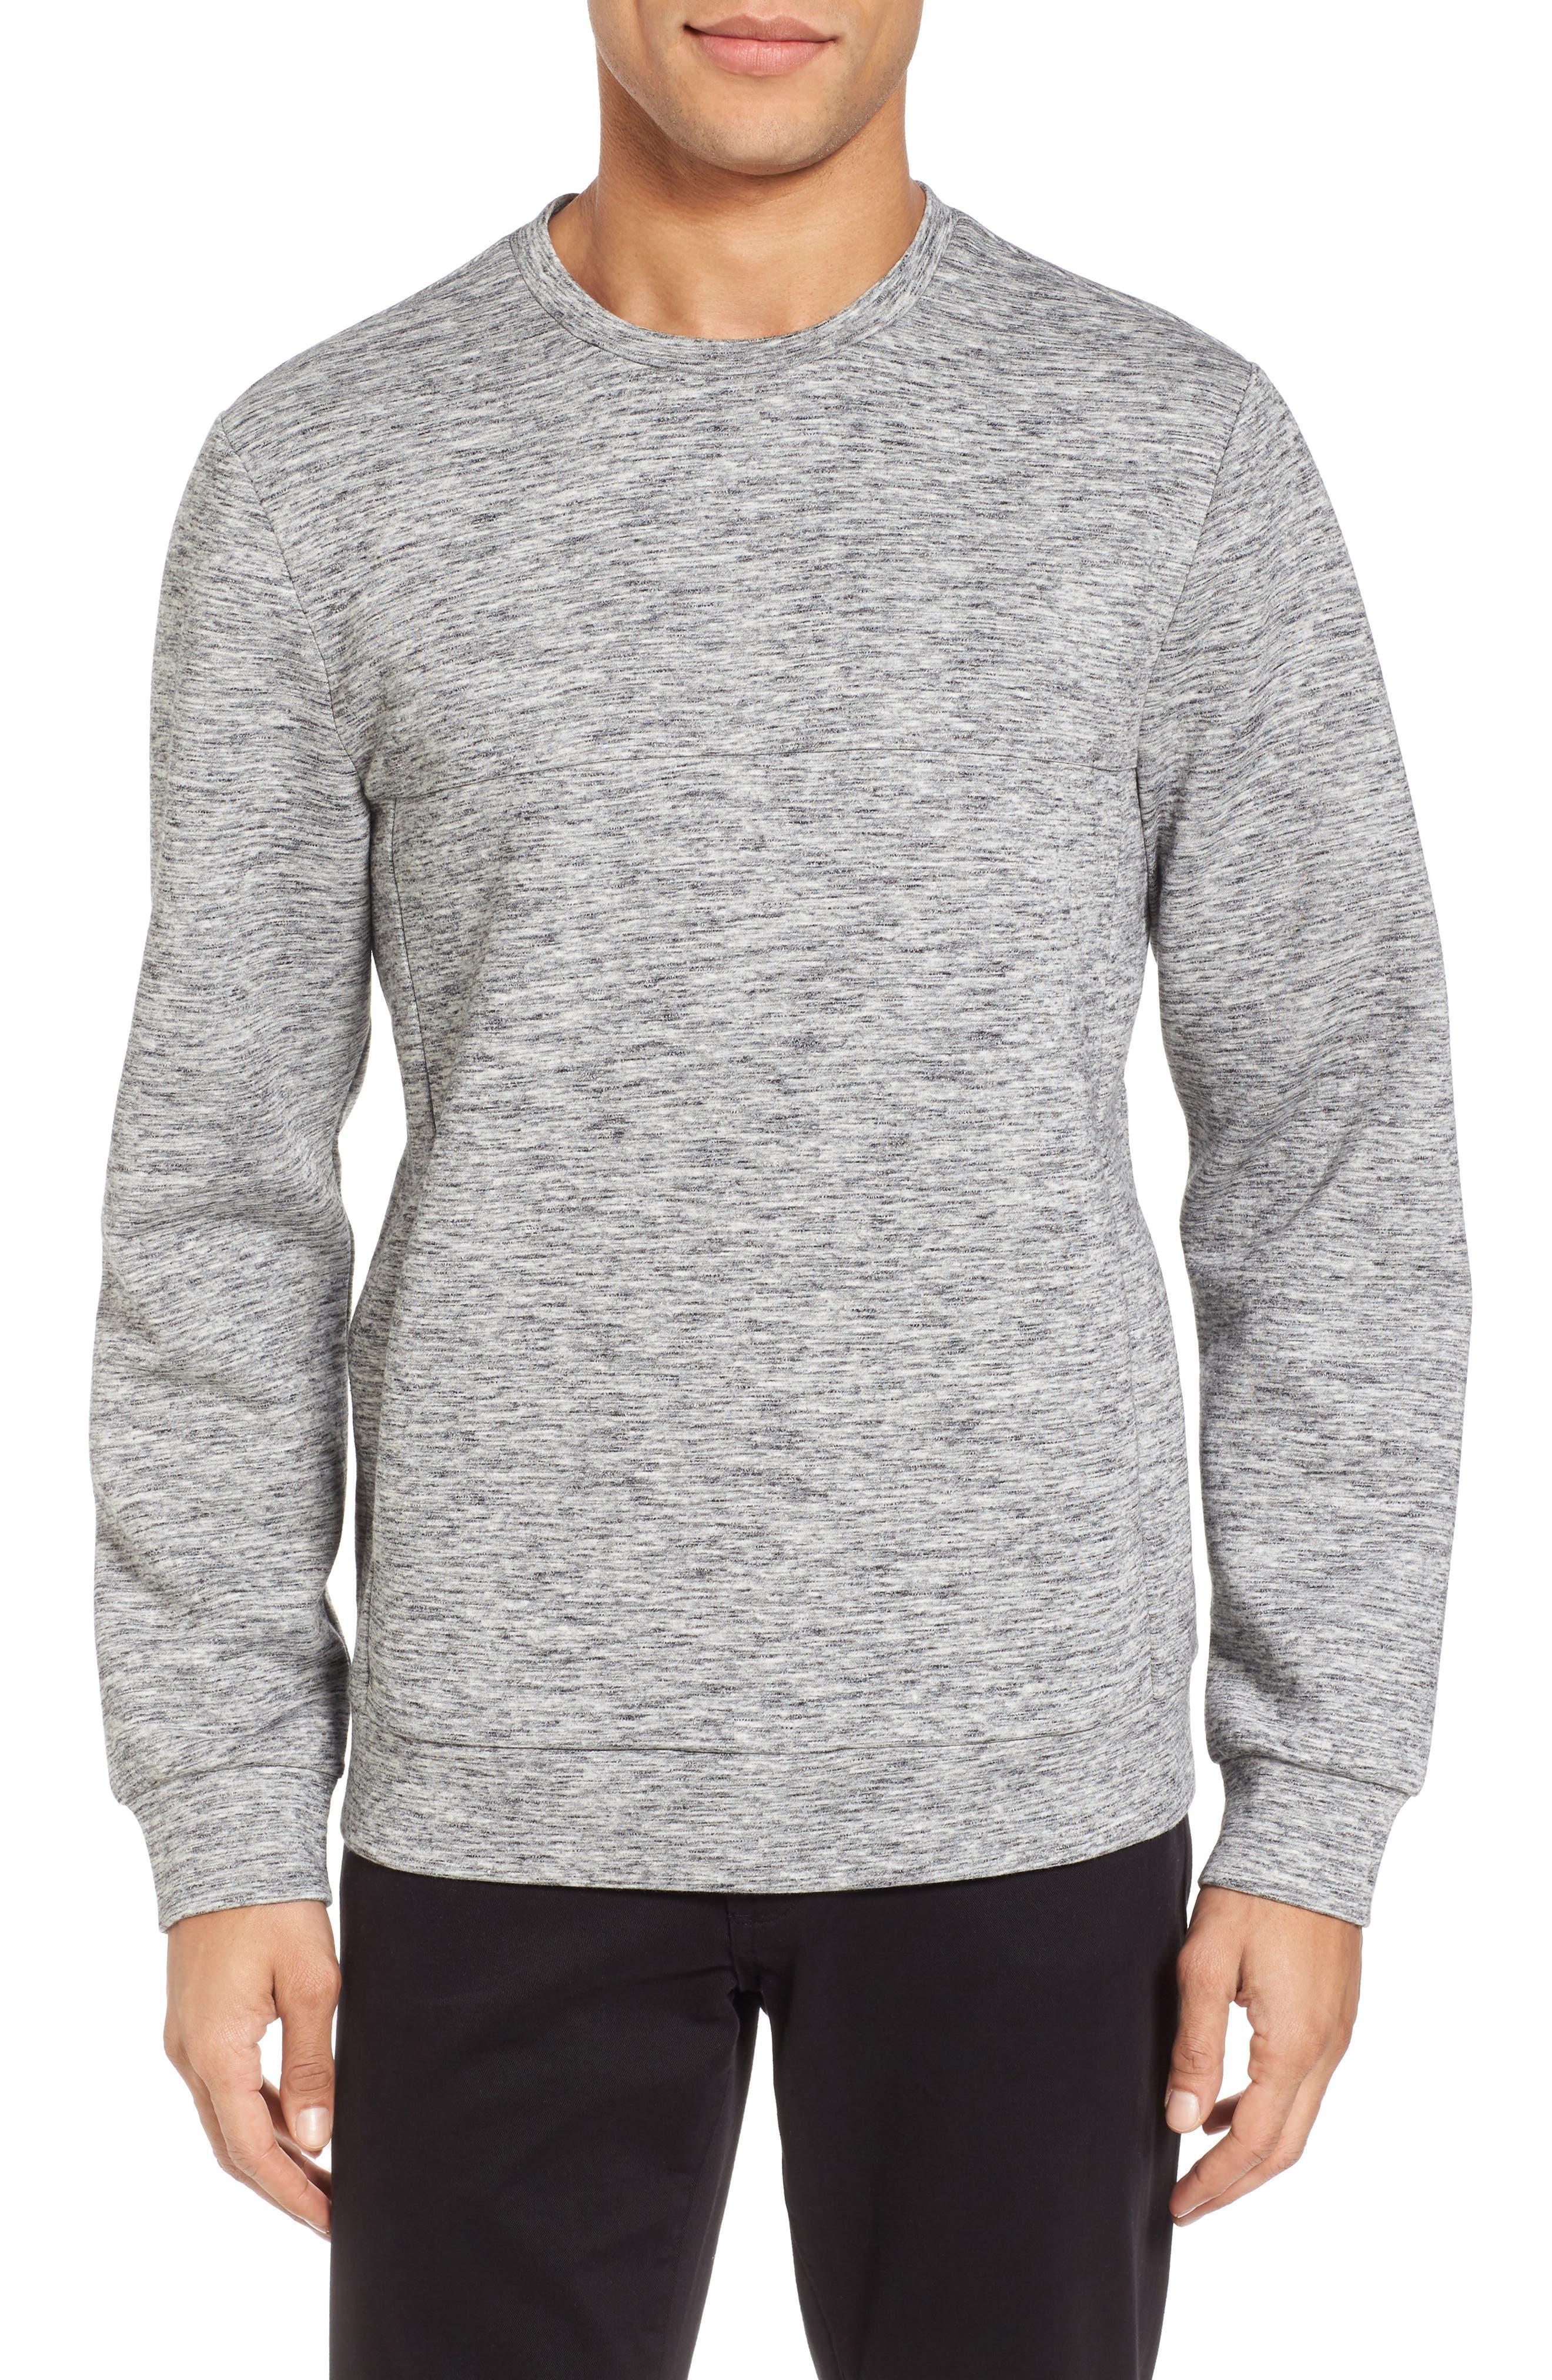 Space Dyed Sweatshirt,                         Main,                         color, Grey Sleet Jaspe